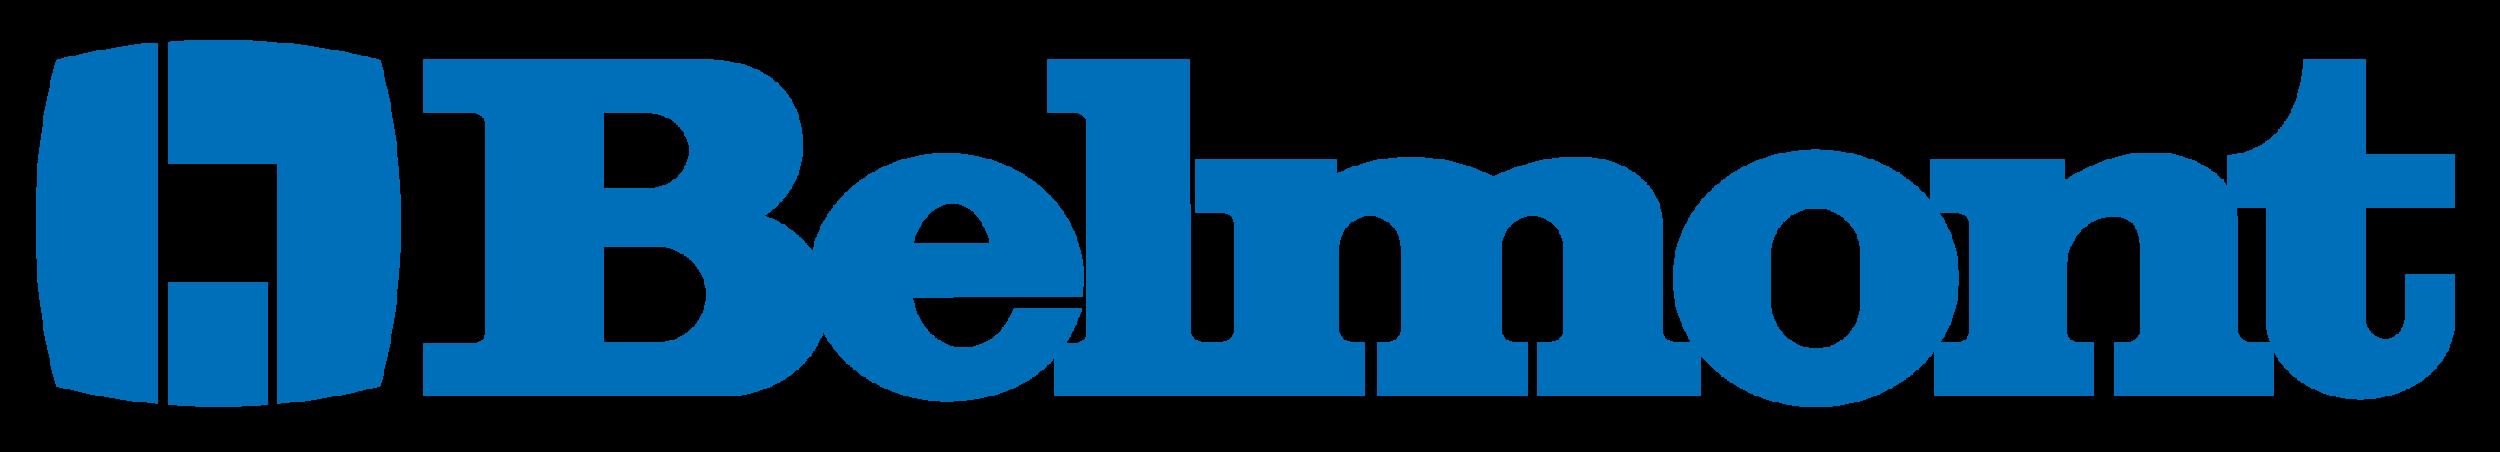 BELMONT-logofilled-blue.png